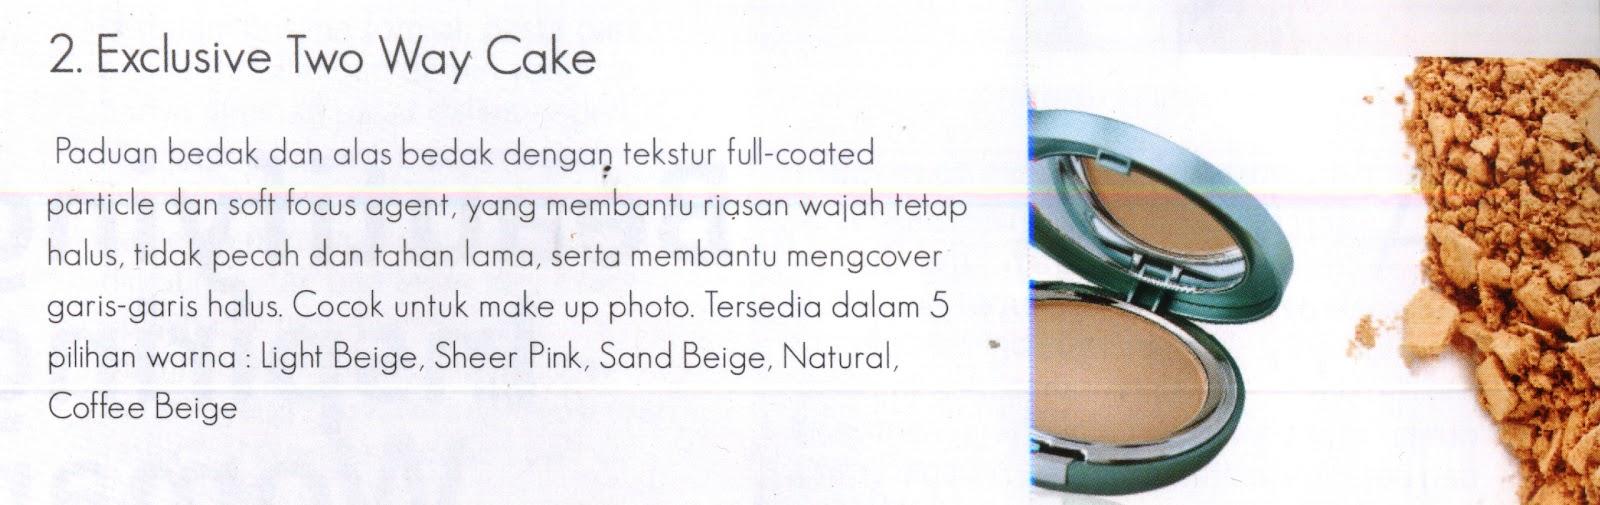 Toko Wardah Exclusive Two Way Cake